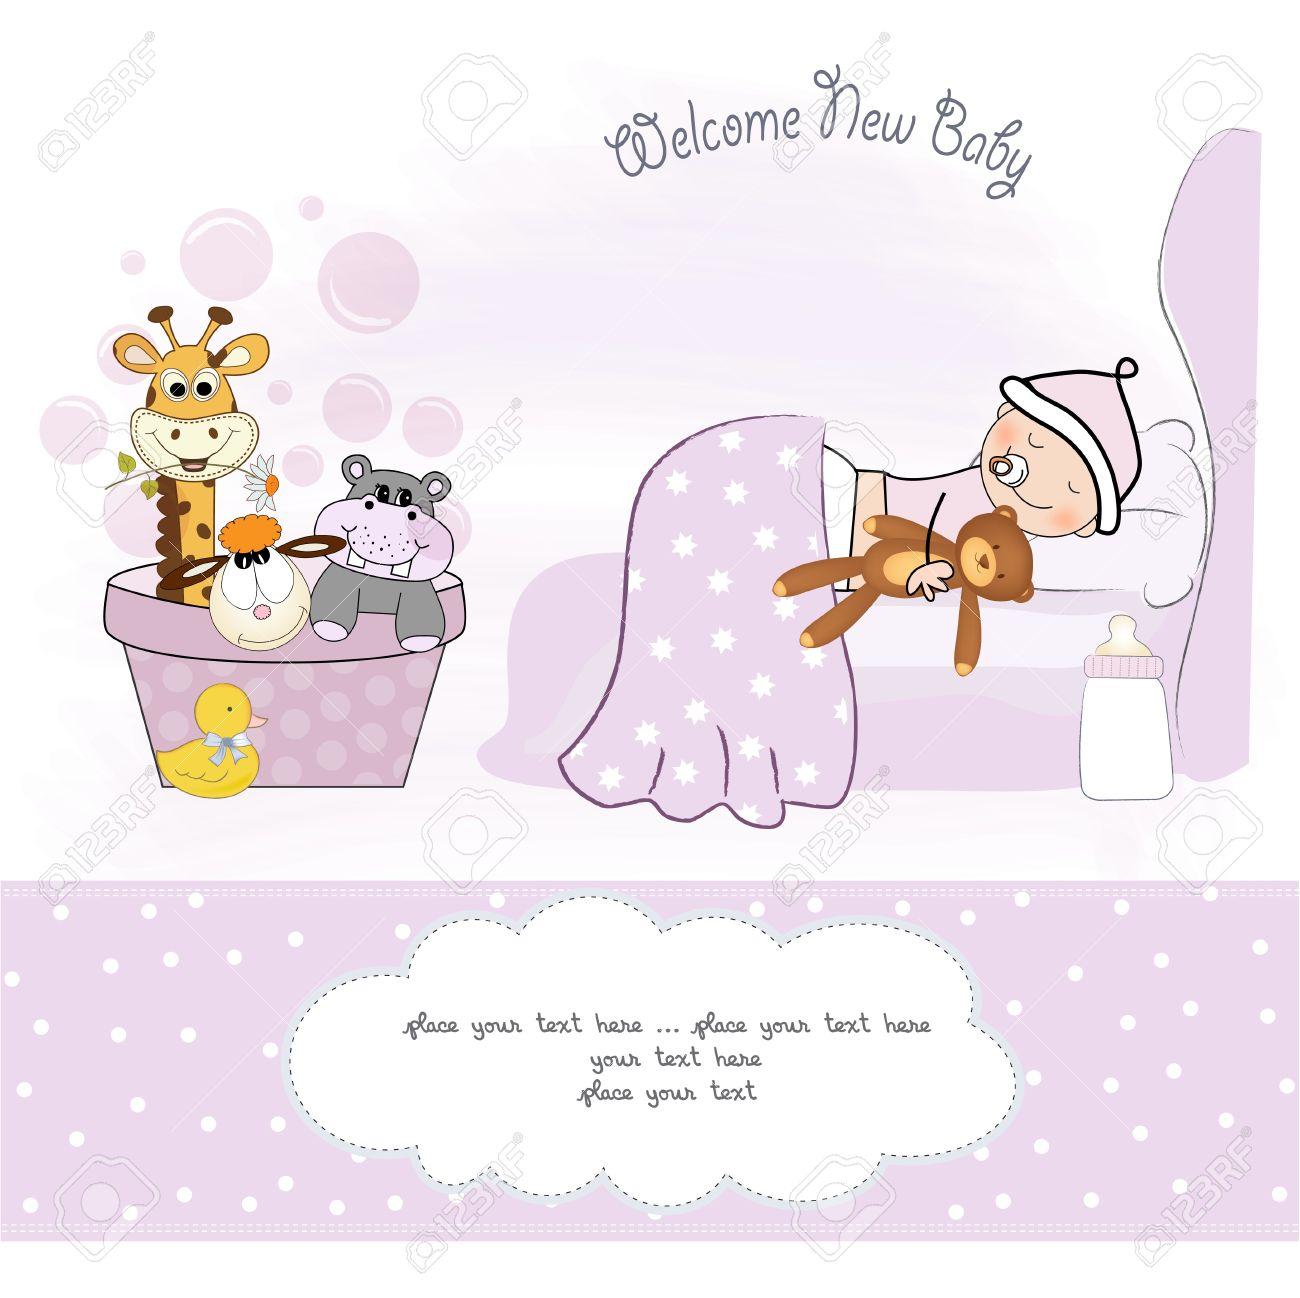 welcome new baby girl Stock Vector - 12599217